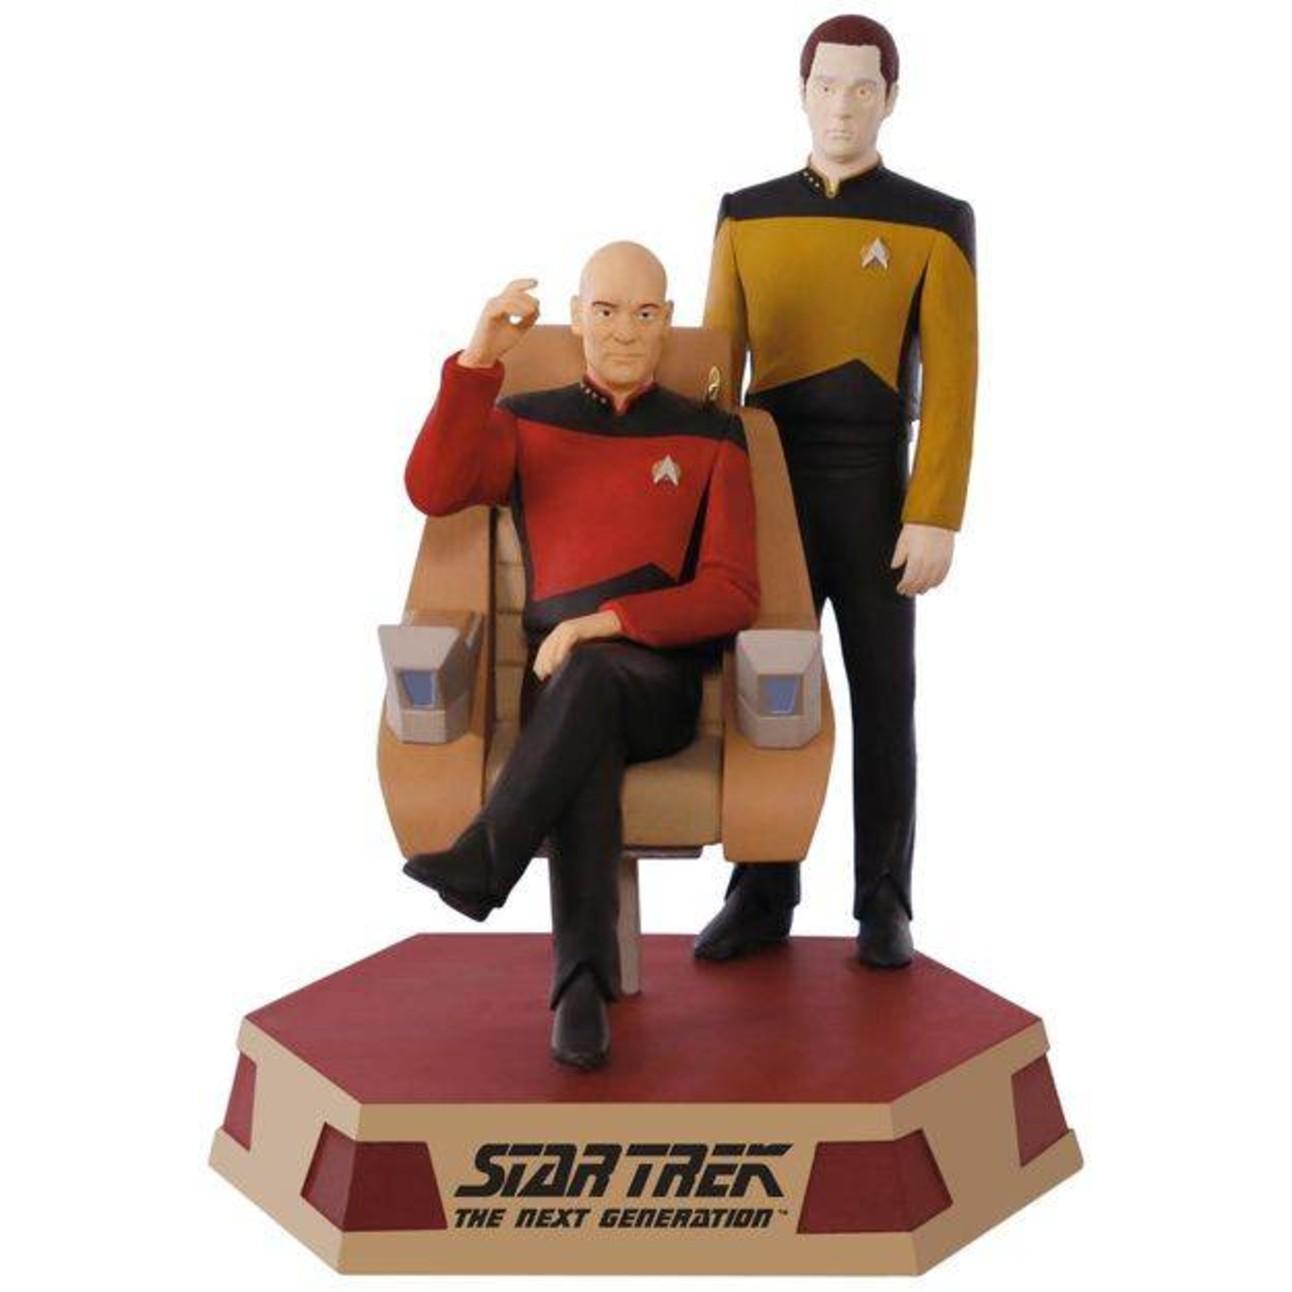 star-trek-the-next-generation-captain-jeanluc-picard-and-lieutenant-commander-data-sound-ornament-root-2995qxi3402_qxi3402_1470_1.jpg_source_image.jpg